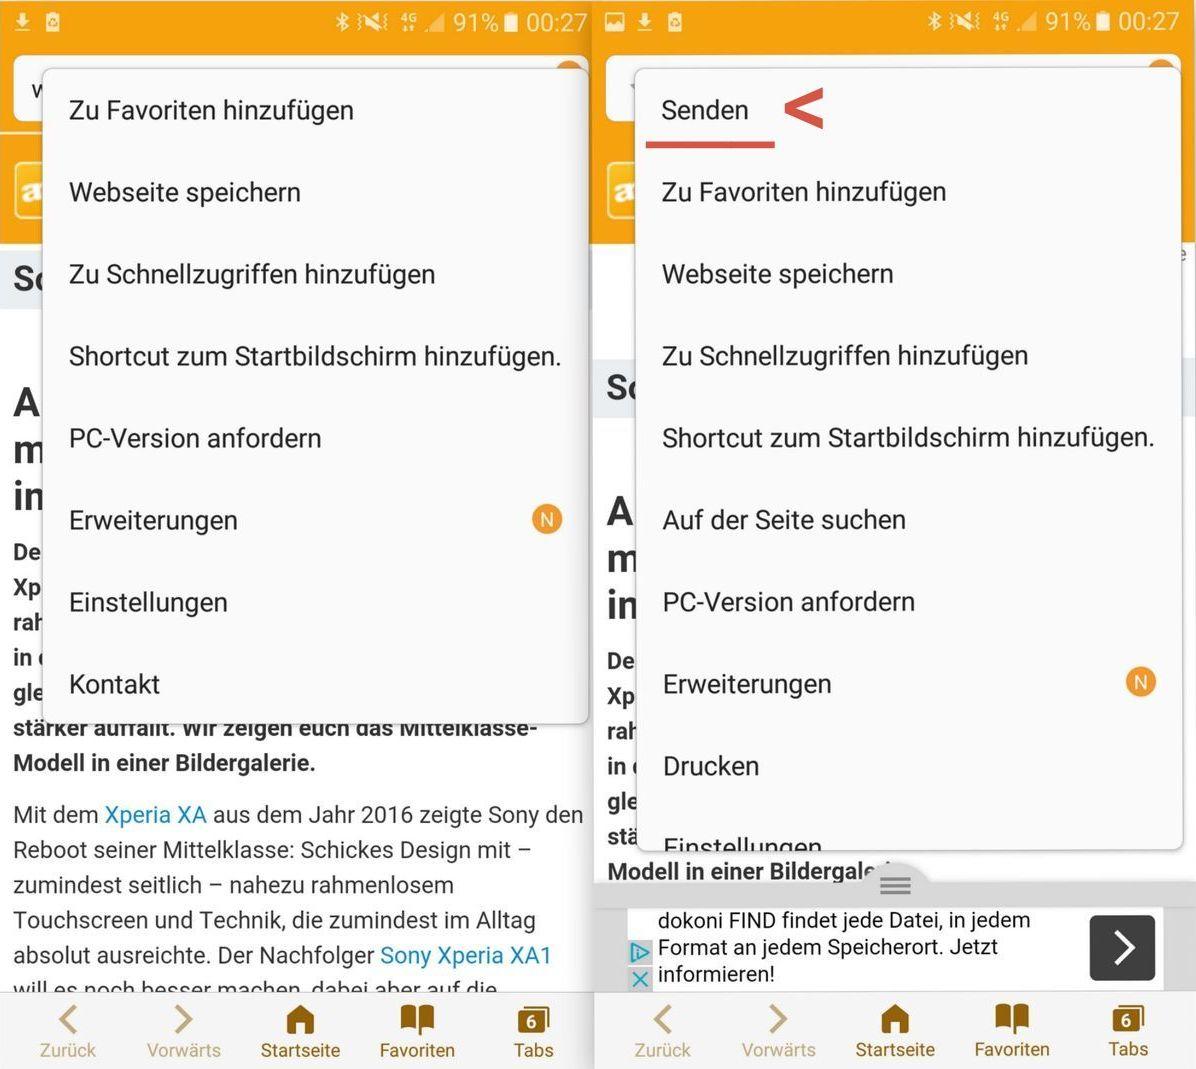 mobile 2 - App Kontrolle - Teilen im Browser - Samsung A5 - SmartTechNews Kopie 2